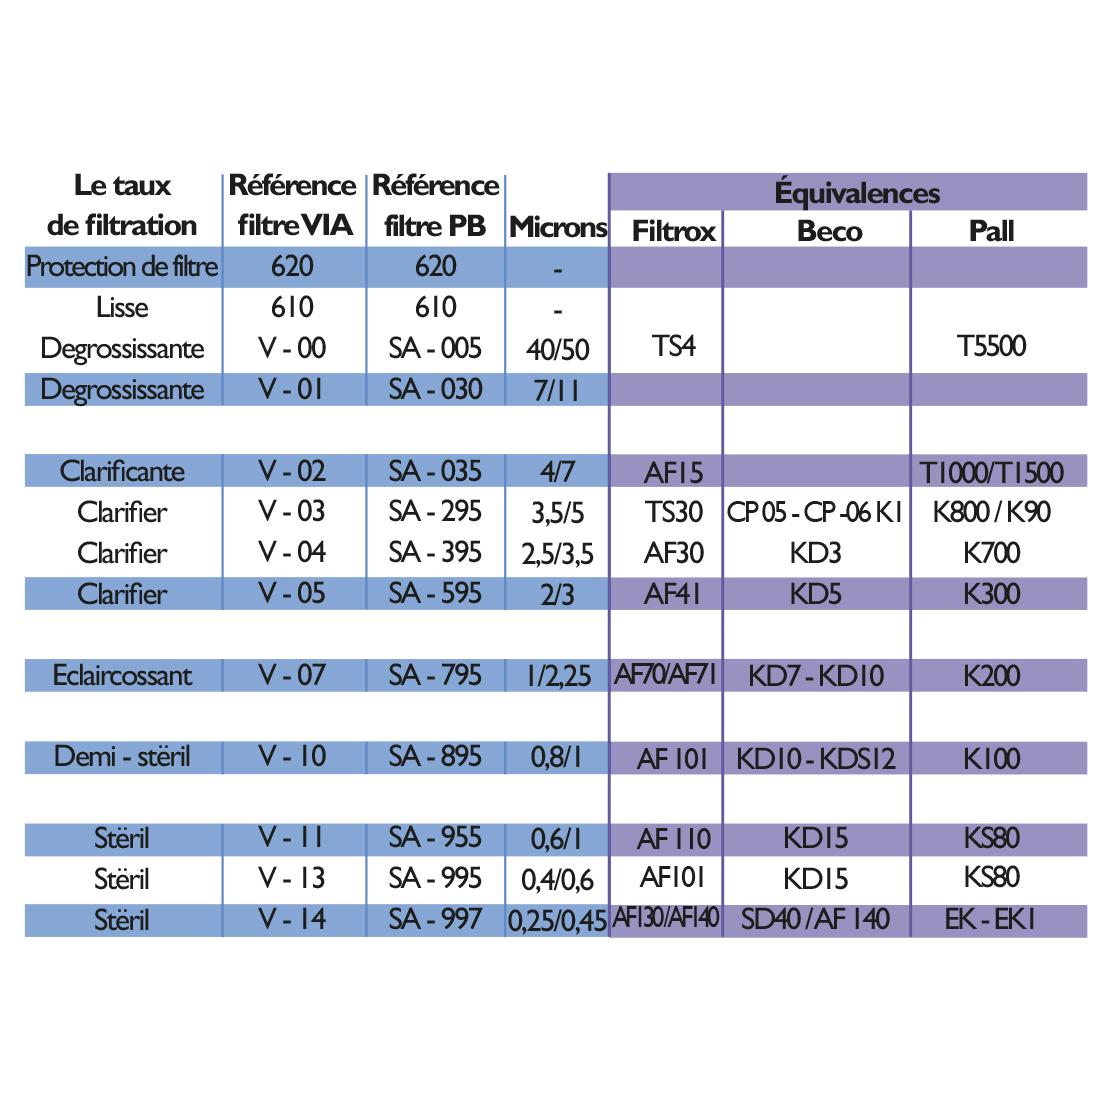 tabla-equivalencias-fr.jpg